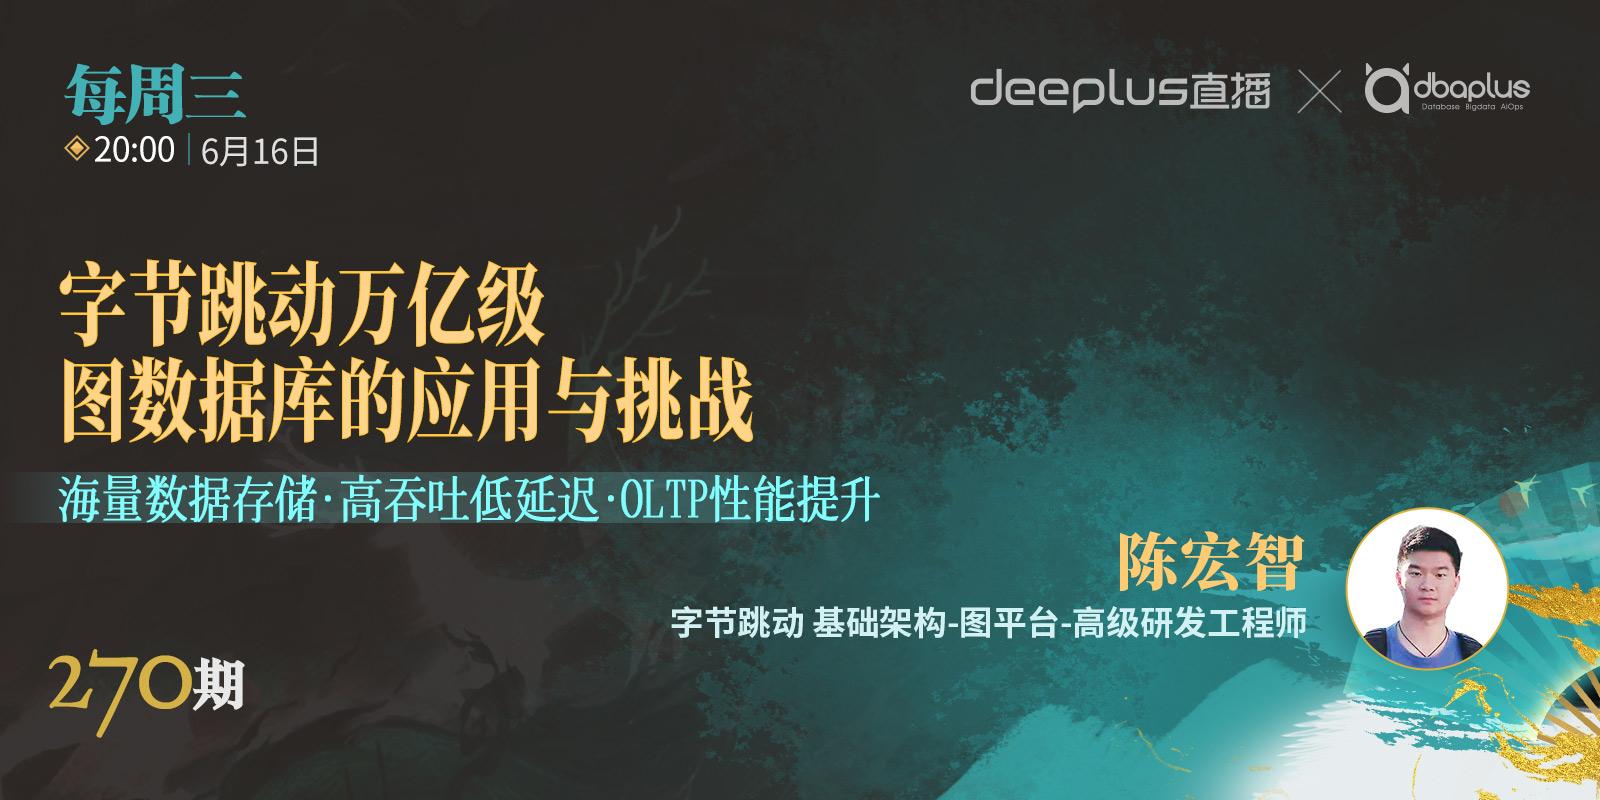 【dbaplus社群线上分享270期】字节跳动万亿级图数据库的应用与挑战